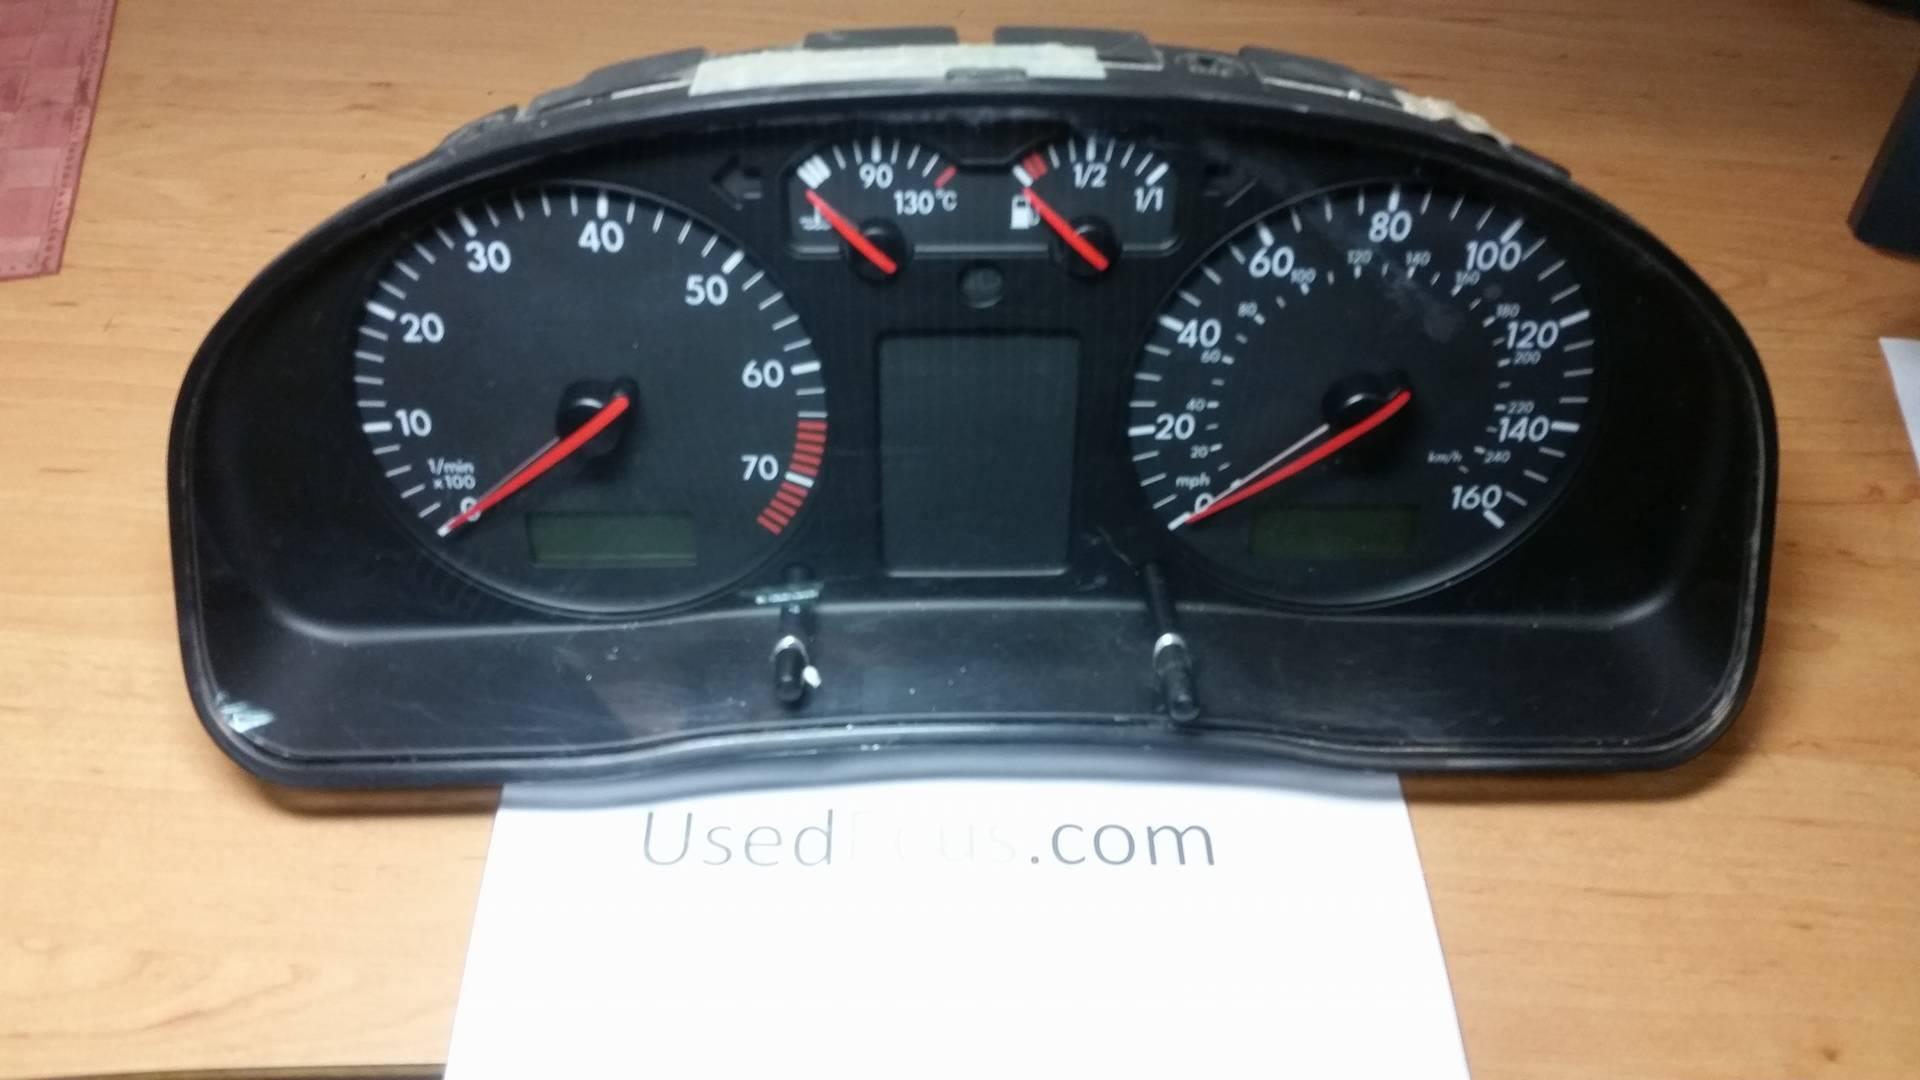 VW PASSAT B5, RHD, PETROL SPEEDO SPEEDOMETER INSTRUMENT CLUSTER